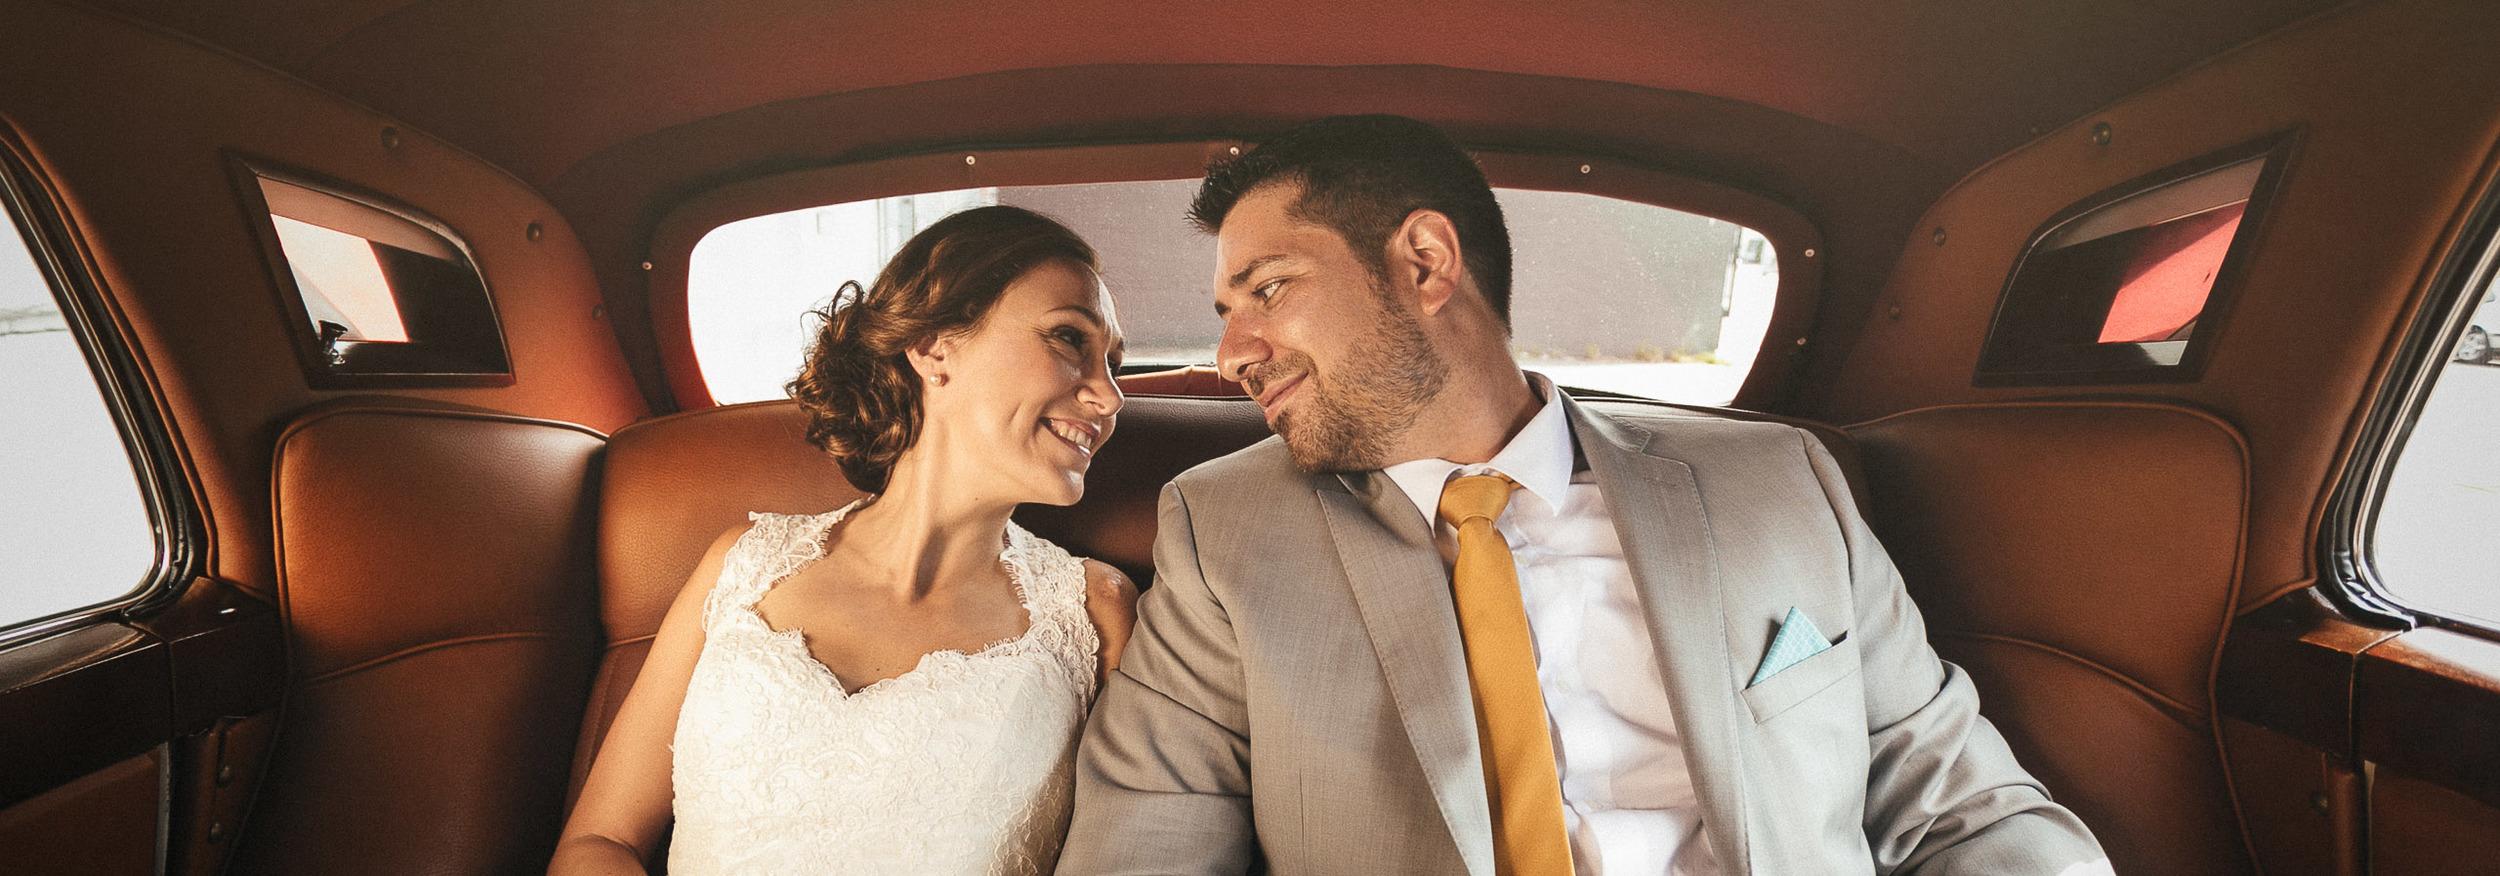 gastown vancouver wedding photography noyo creative